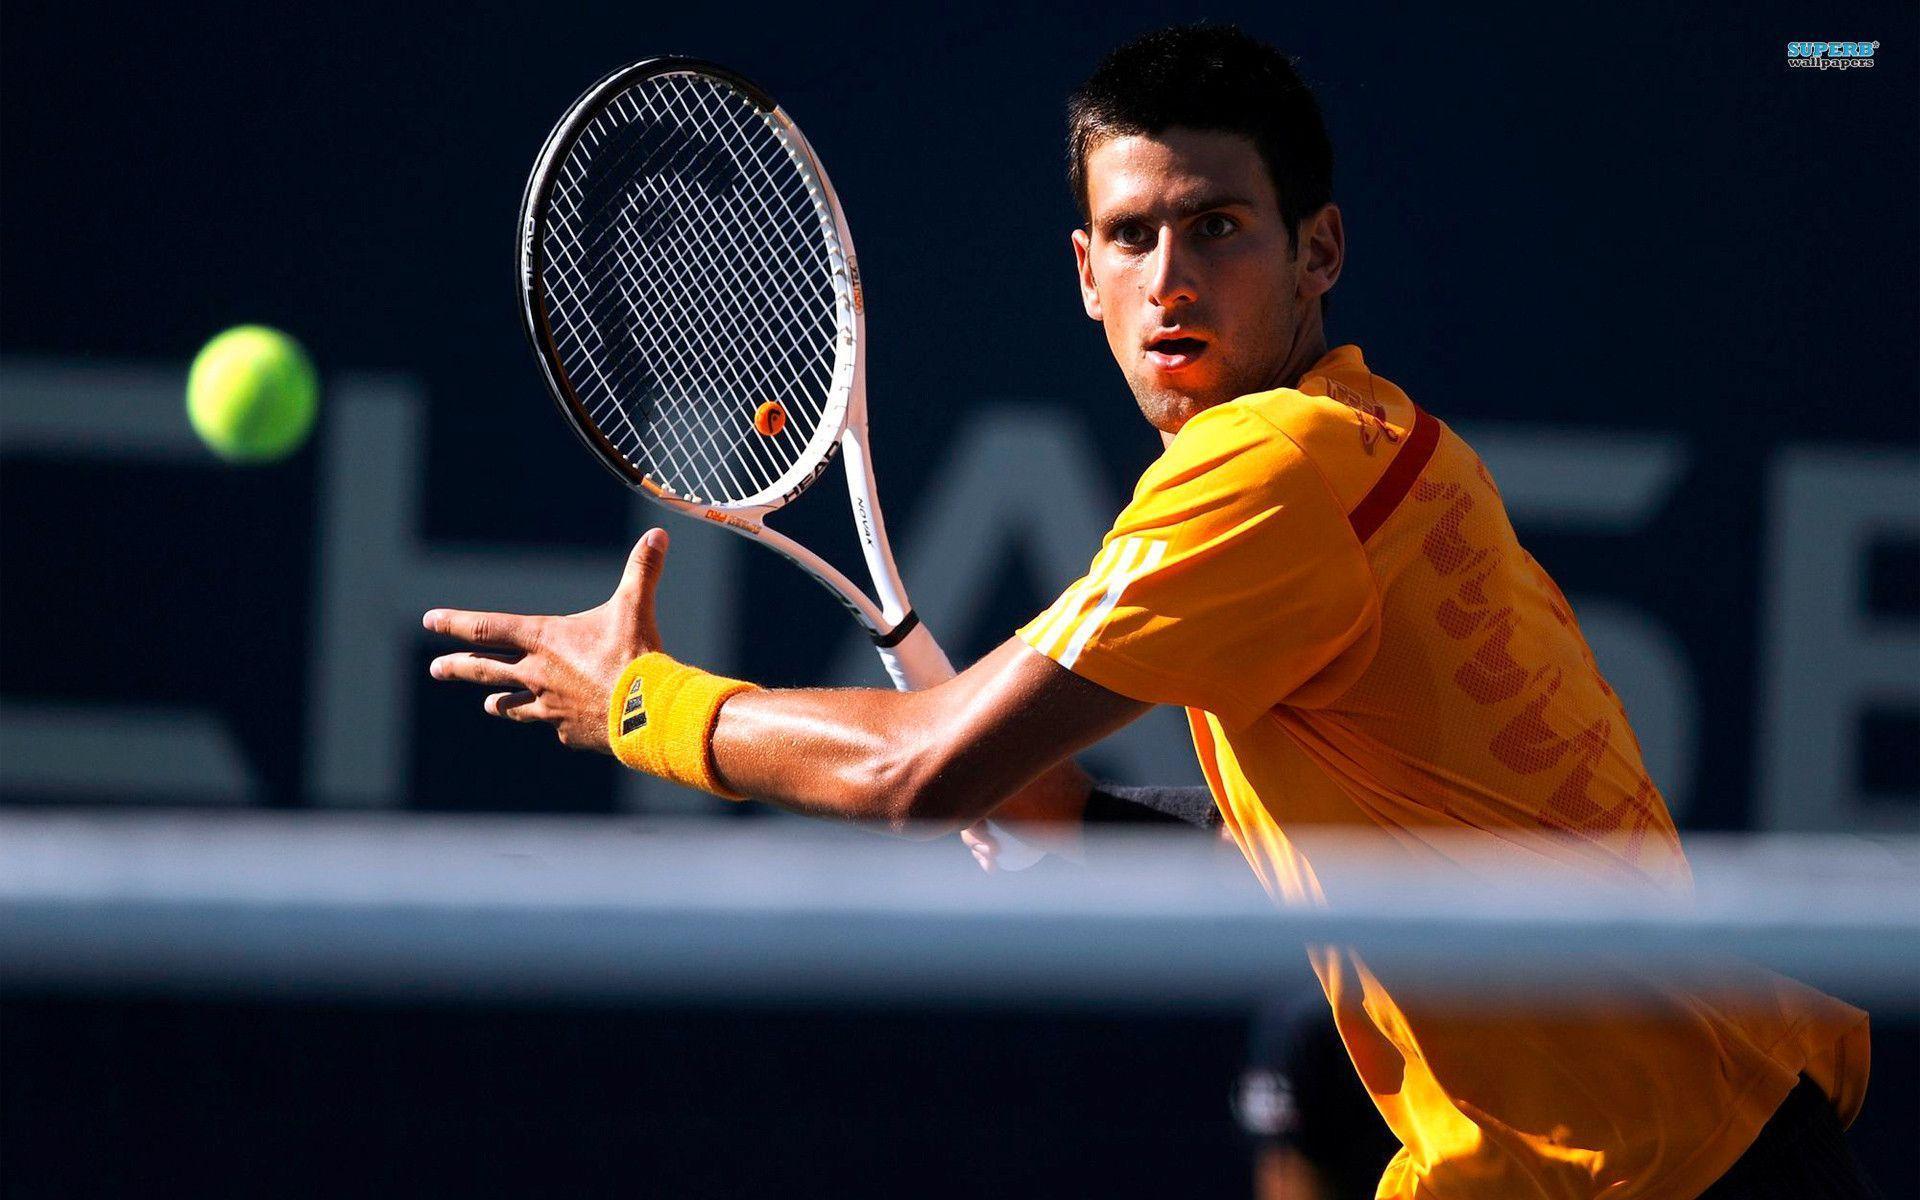 Novak Djokovic Wallpapers - HD Wallpapers Inn